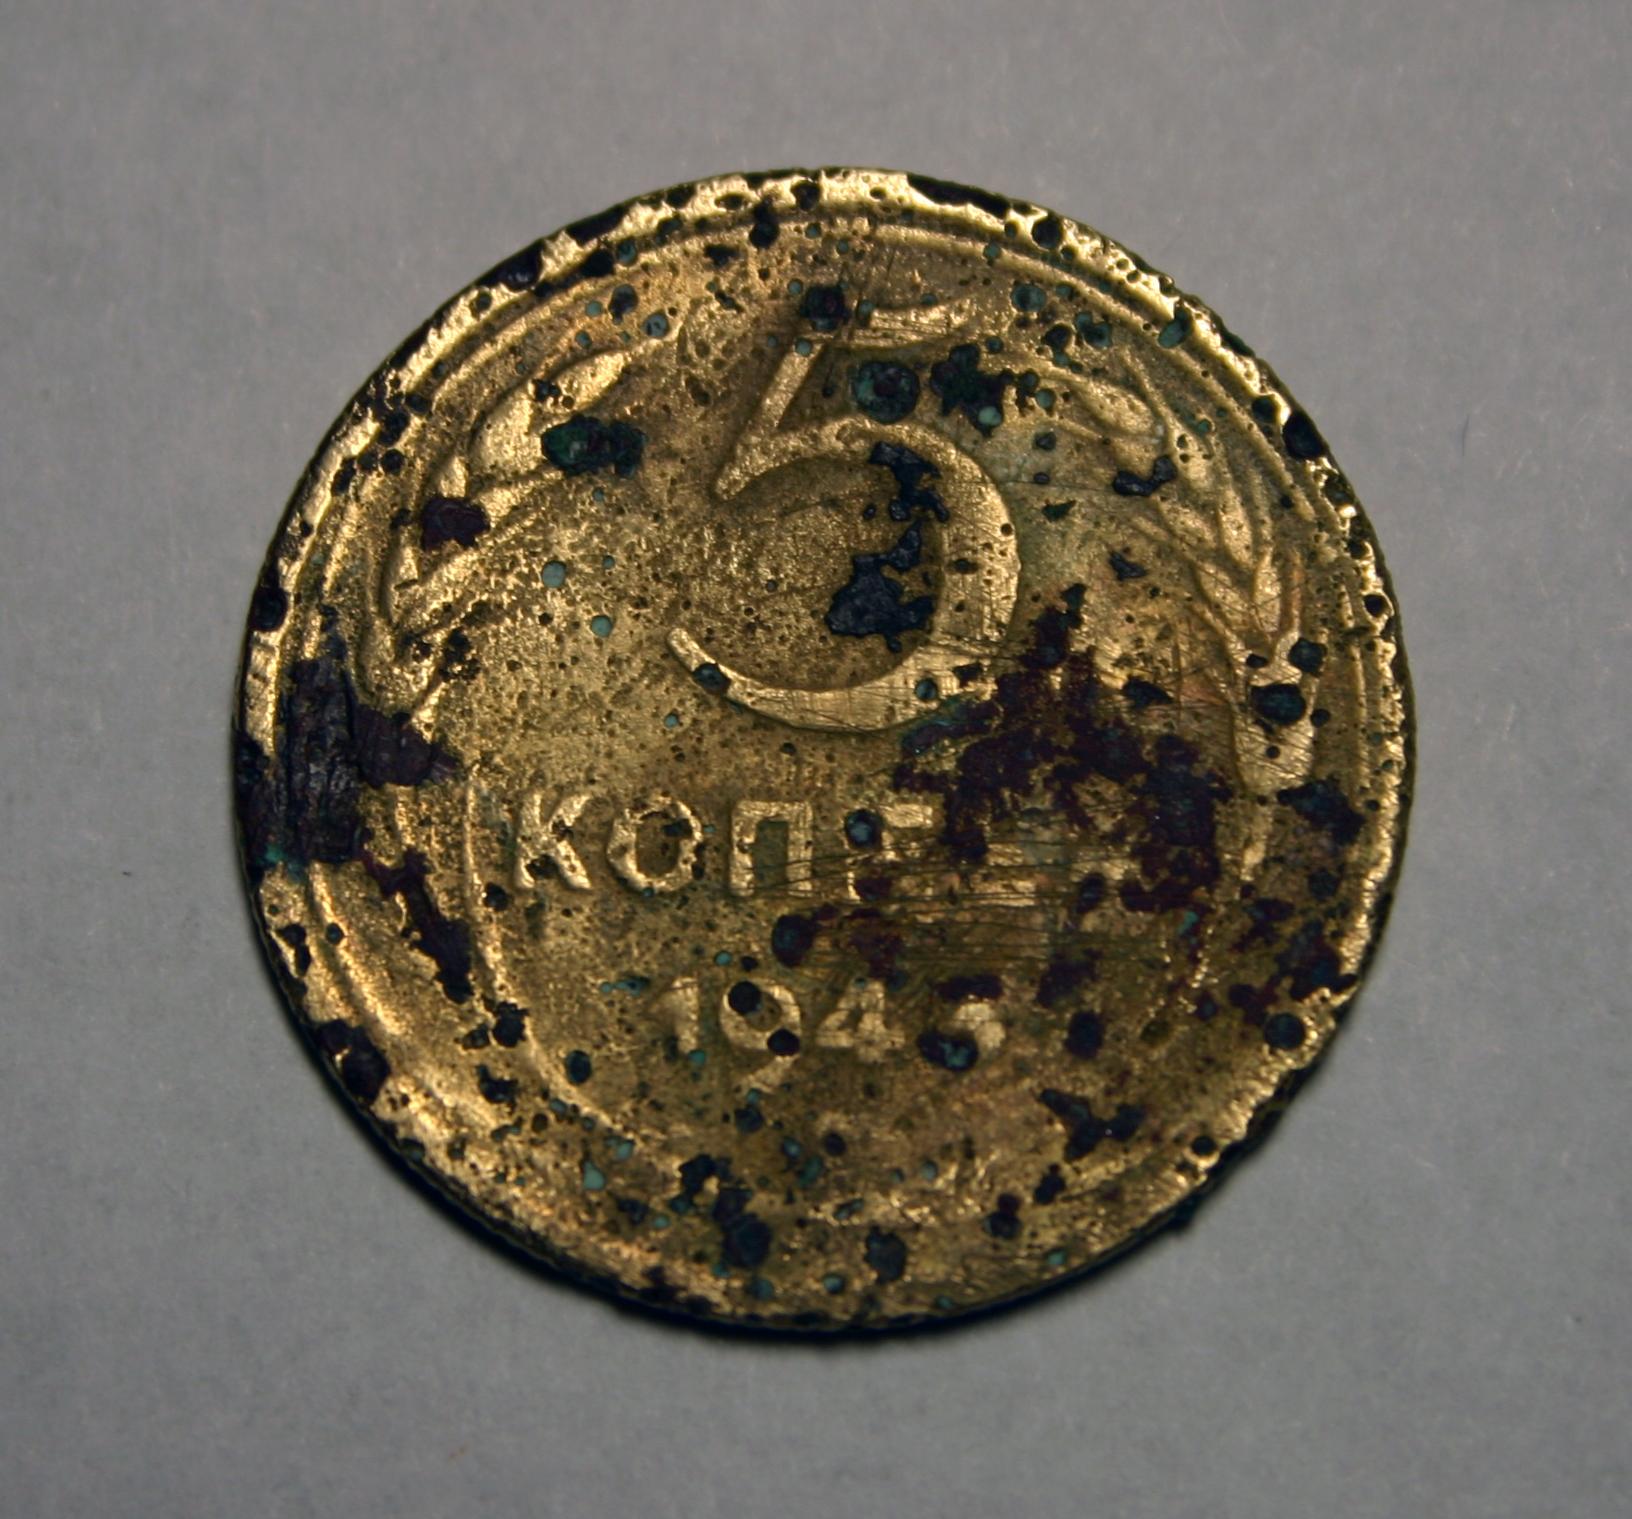 K10_121